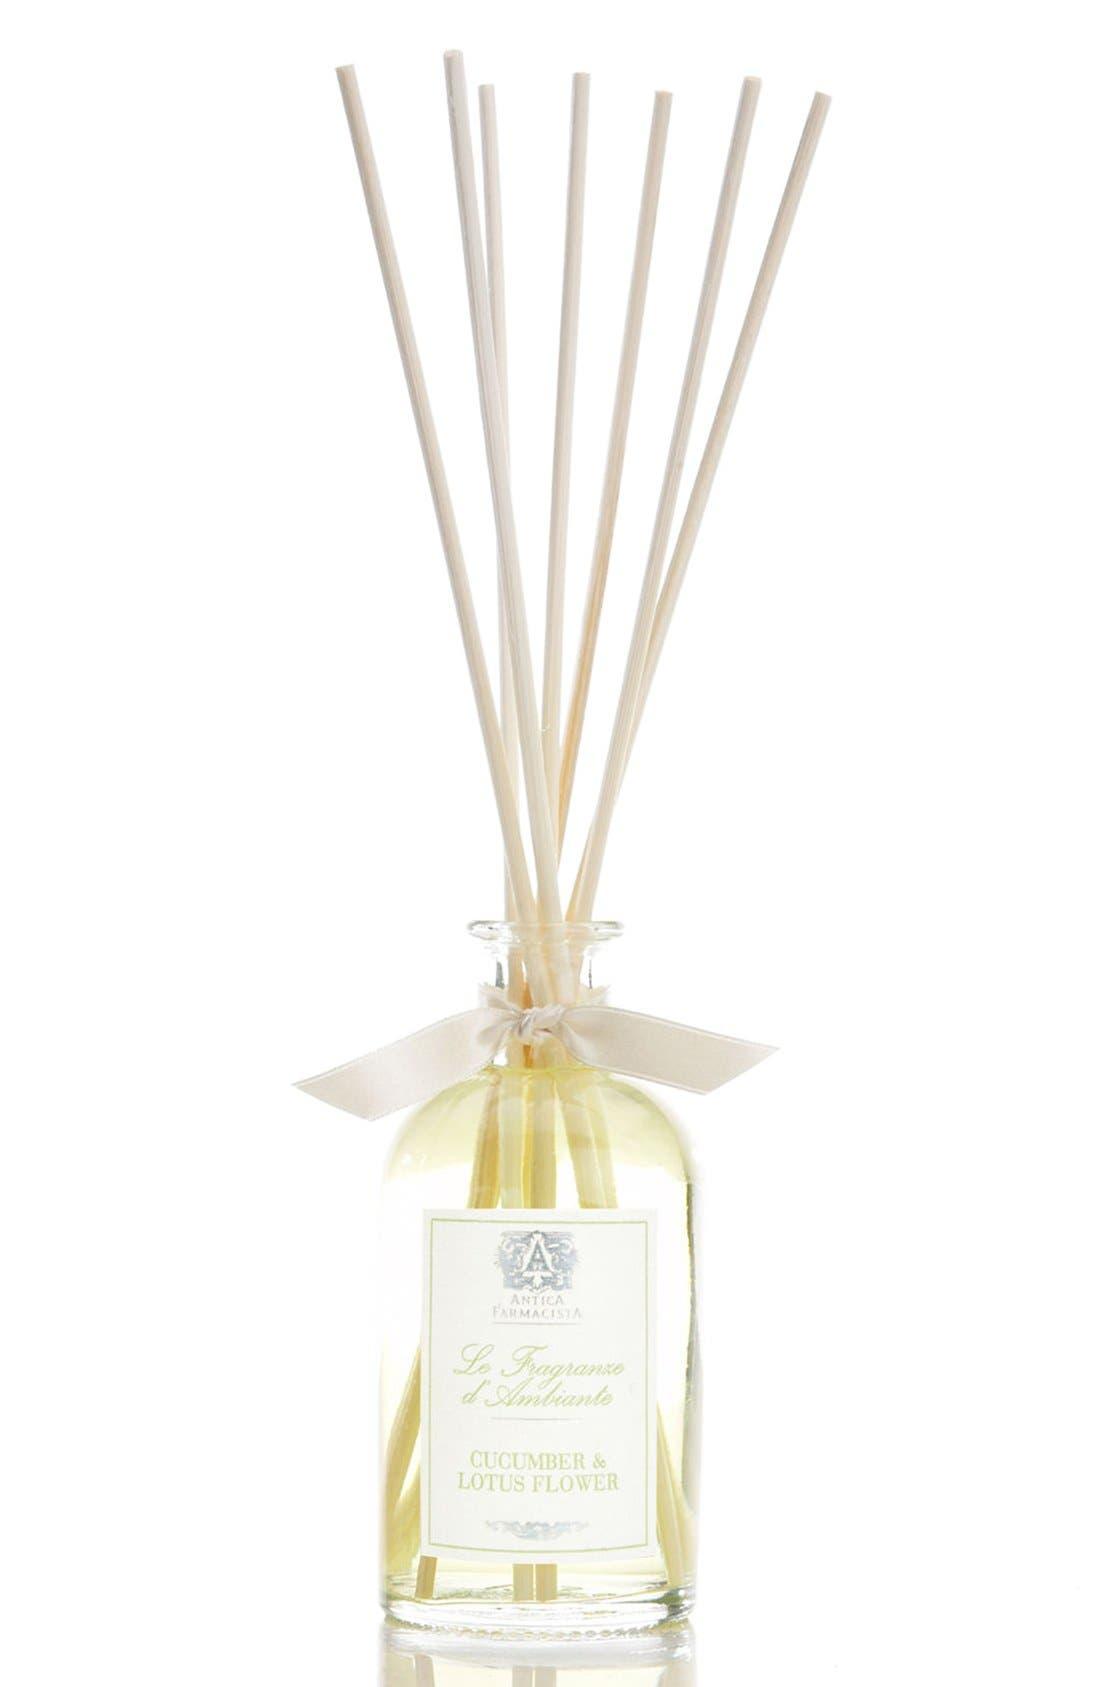 Antica Farmacista Cucumber & Lotus Flower Home Ambiance Perfume (3.3 oz.)